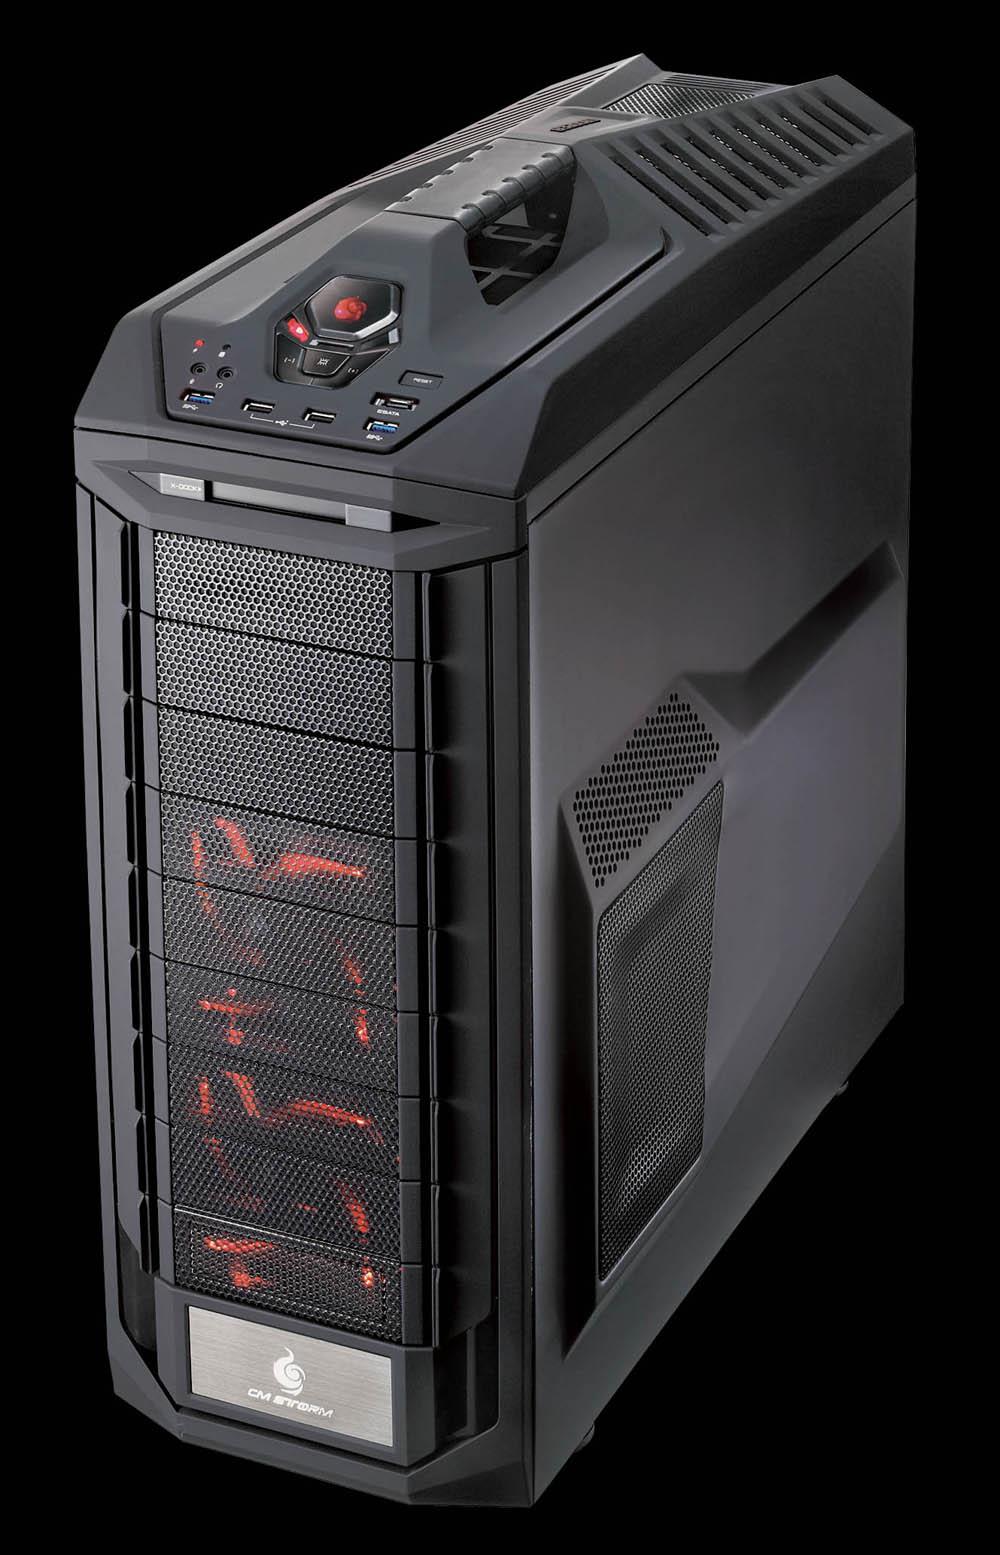 boitier pc cooler master storm trooper sgc 5000 kkn1 sans alim. Black Bedroom Furniture Sets. Home Design Ideas